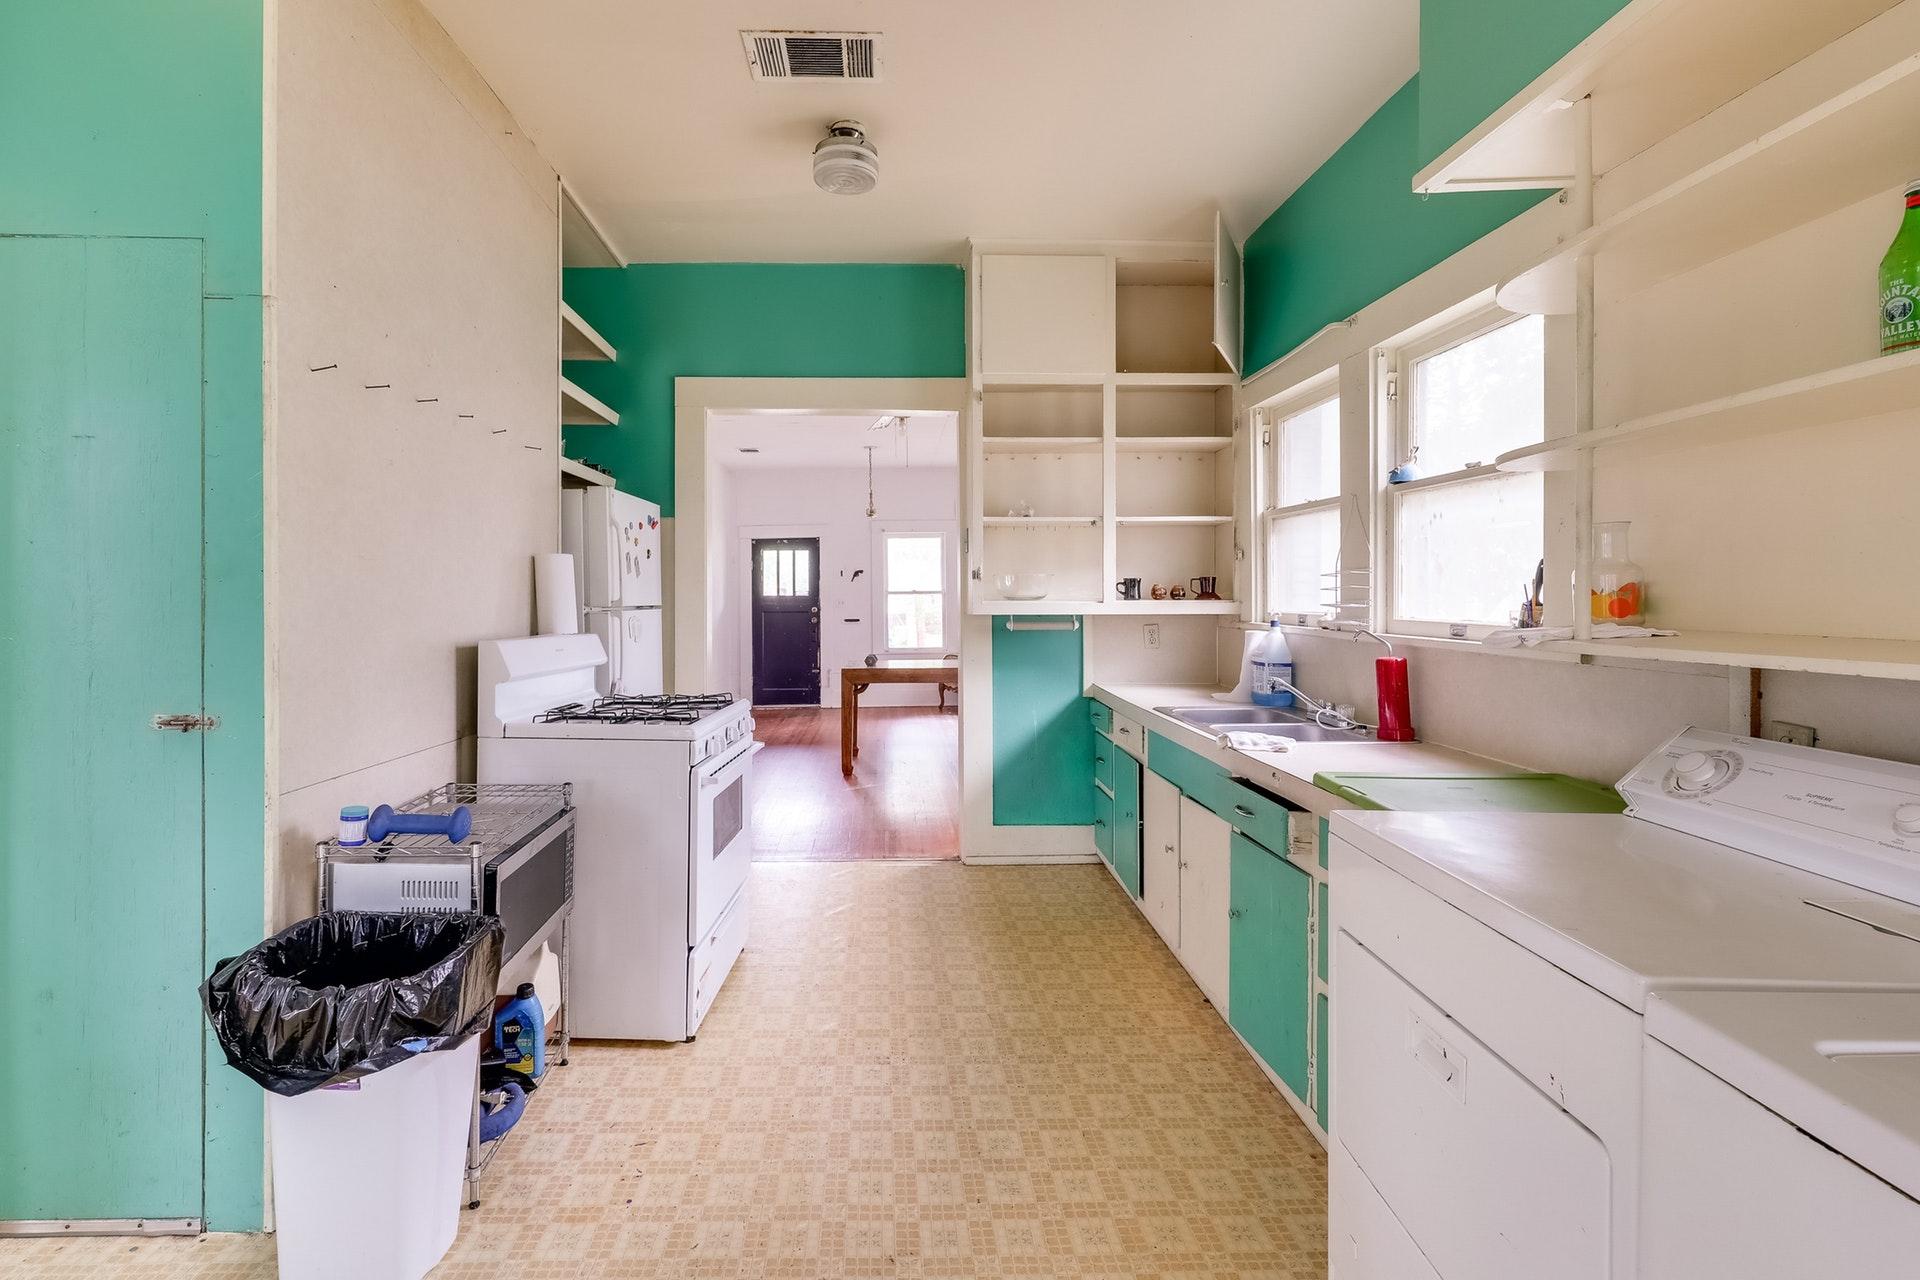 2309 Lafayette Ave - Kitchen 2